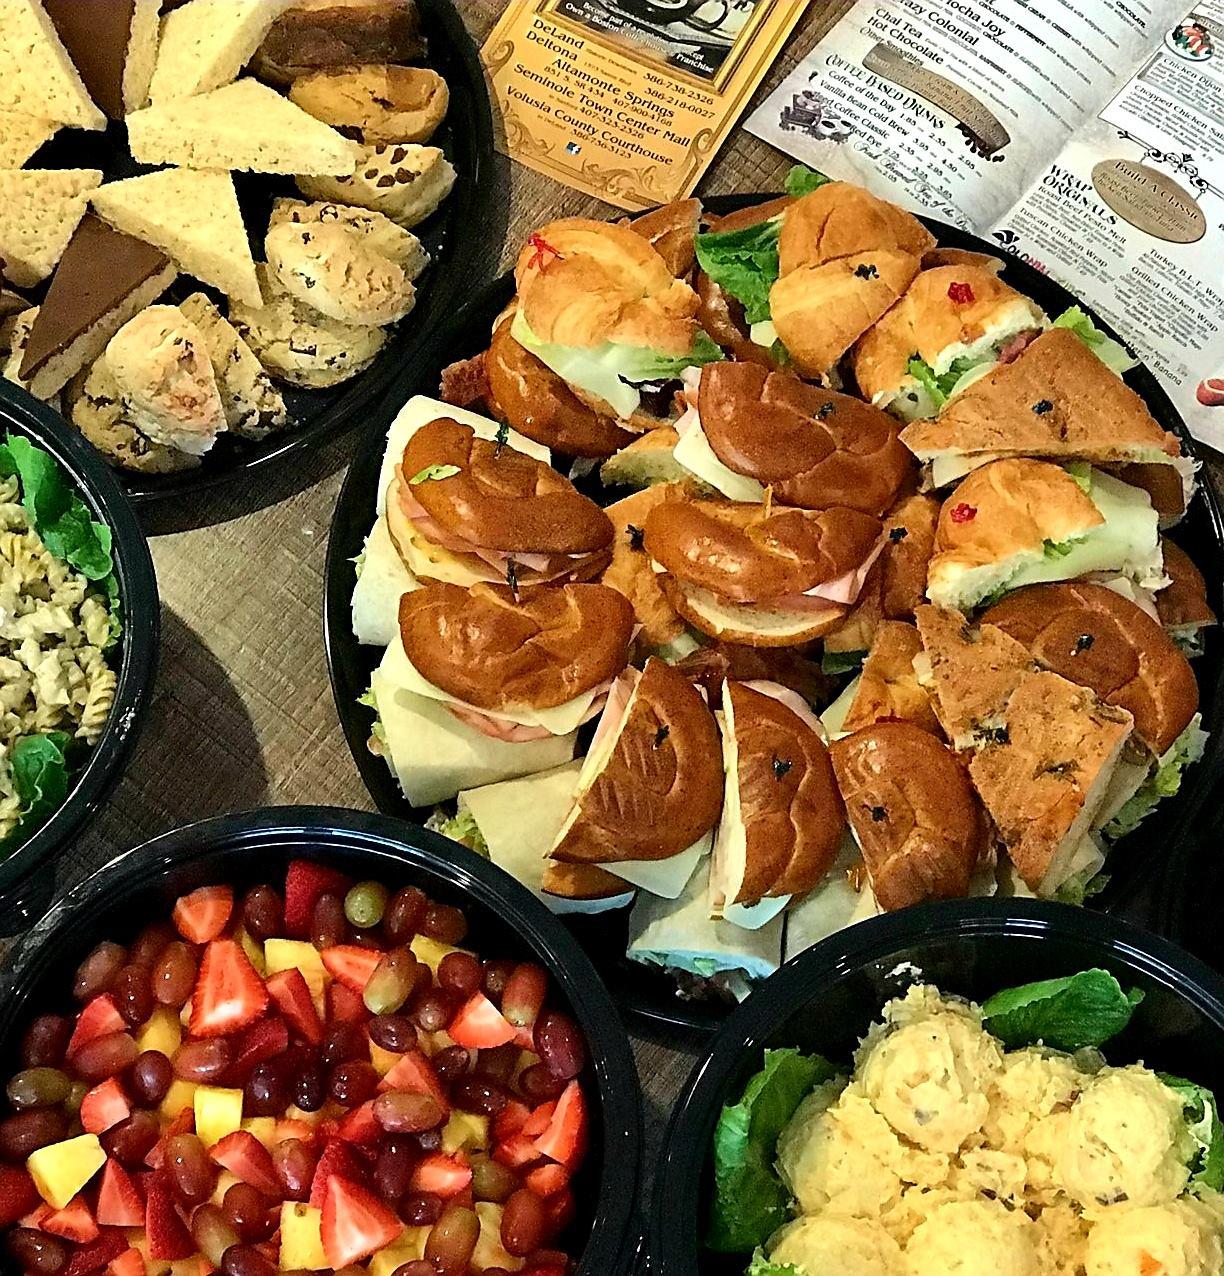 Boston Coffeehouse Altamonte Springs catering